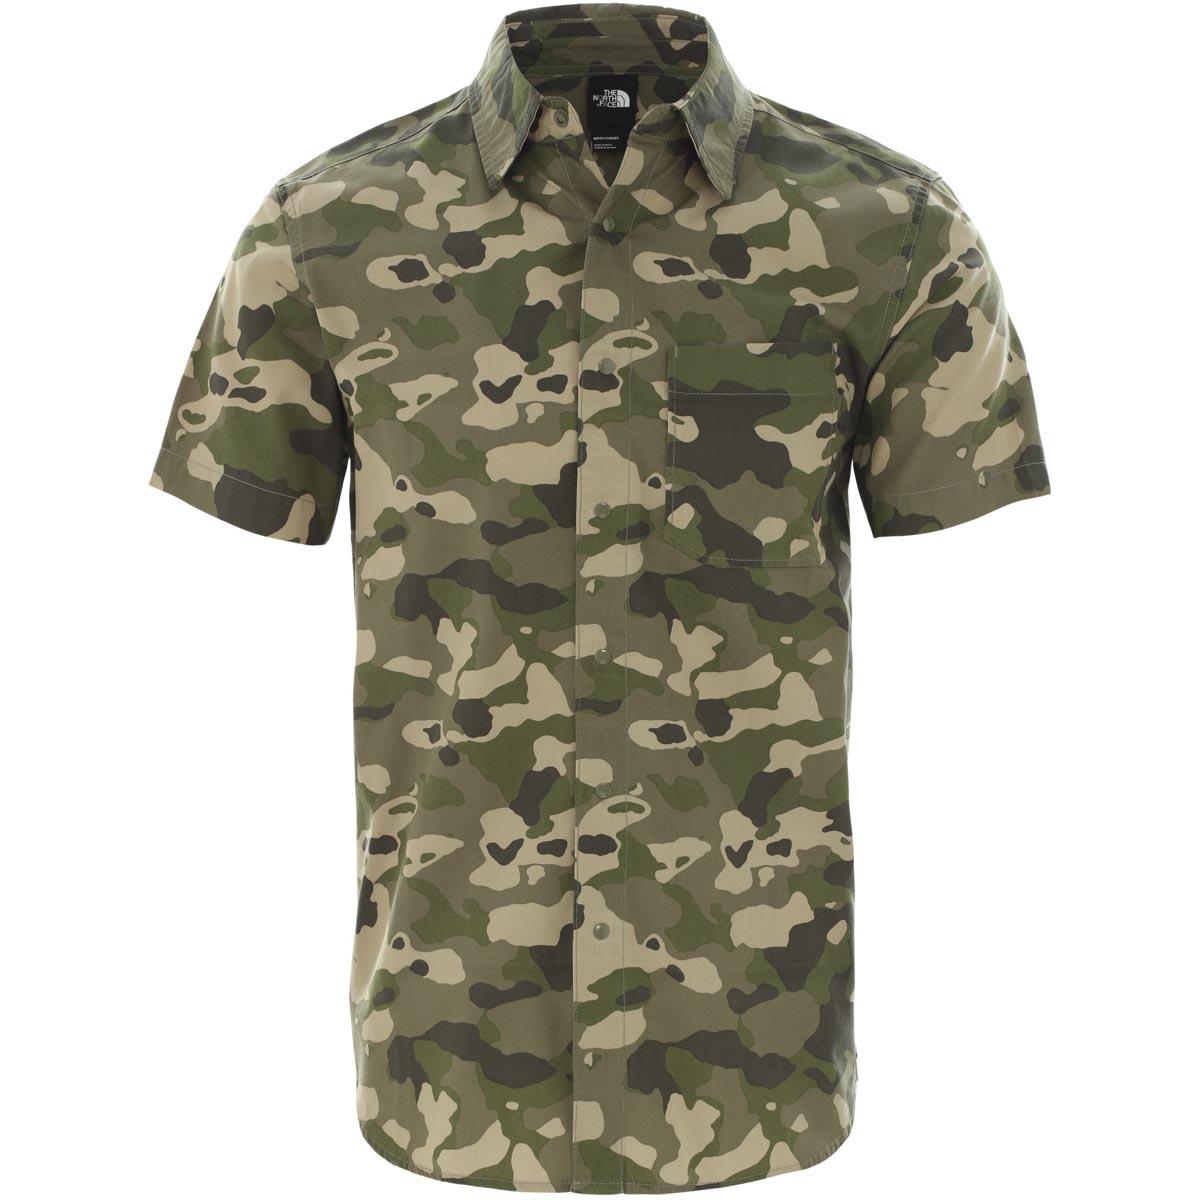 Рубашка S/S BAYTRAIL PATTERN SHIRT